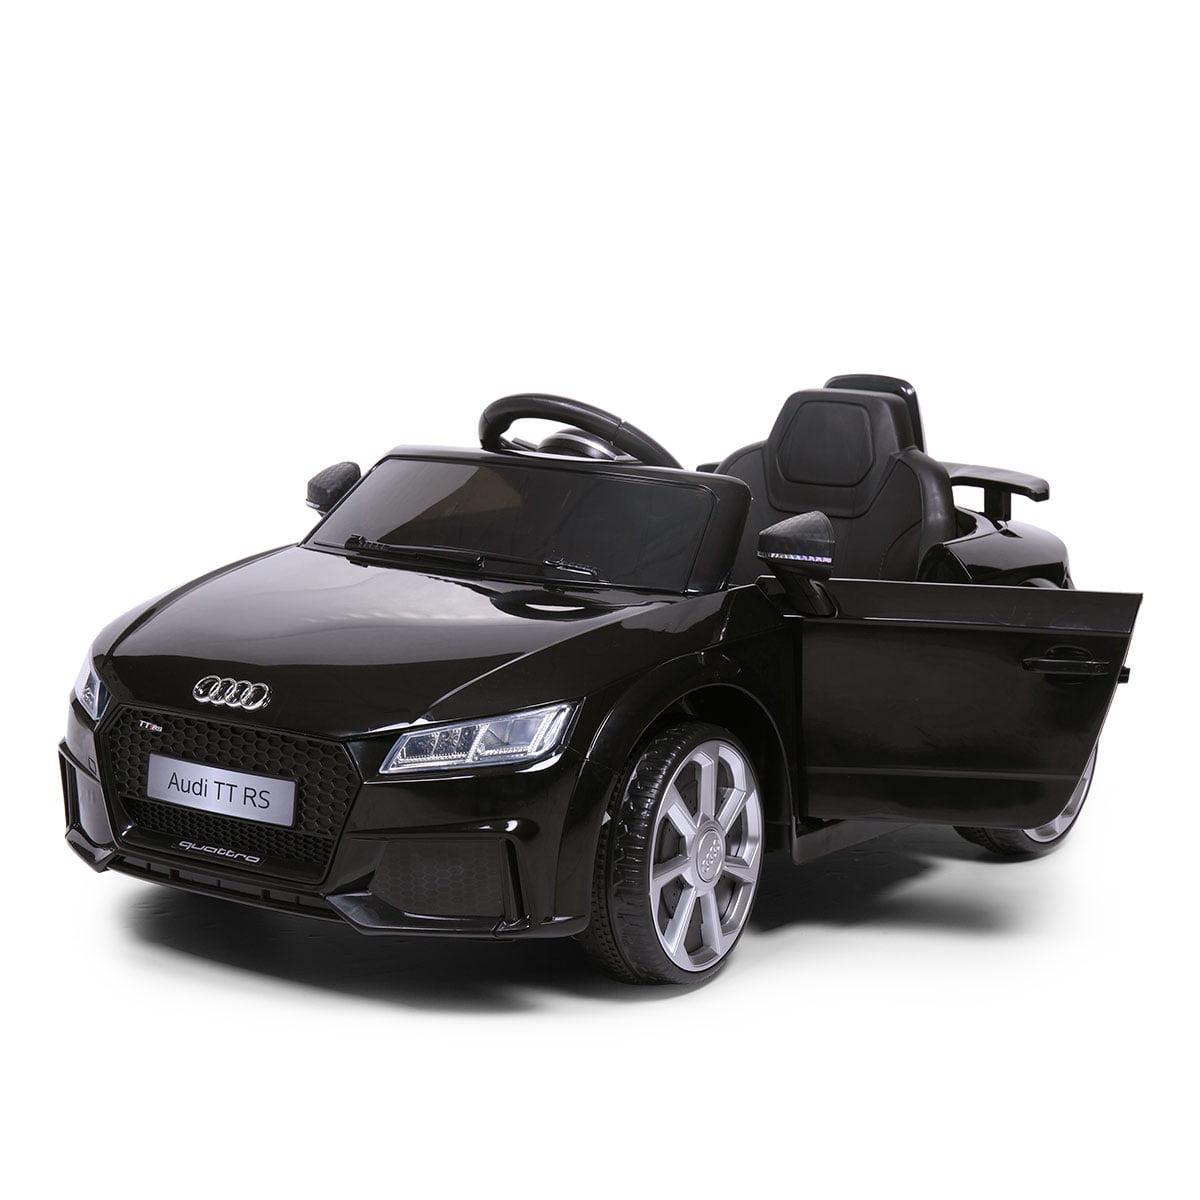 12V Audi TT RS Electric Kids Ride On Car Licensed Remote Control MP3 White